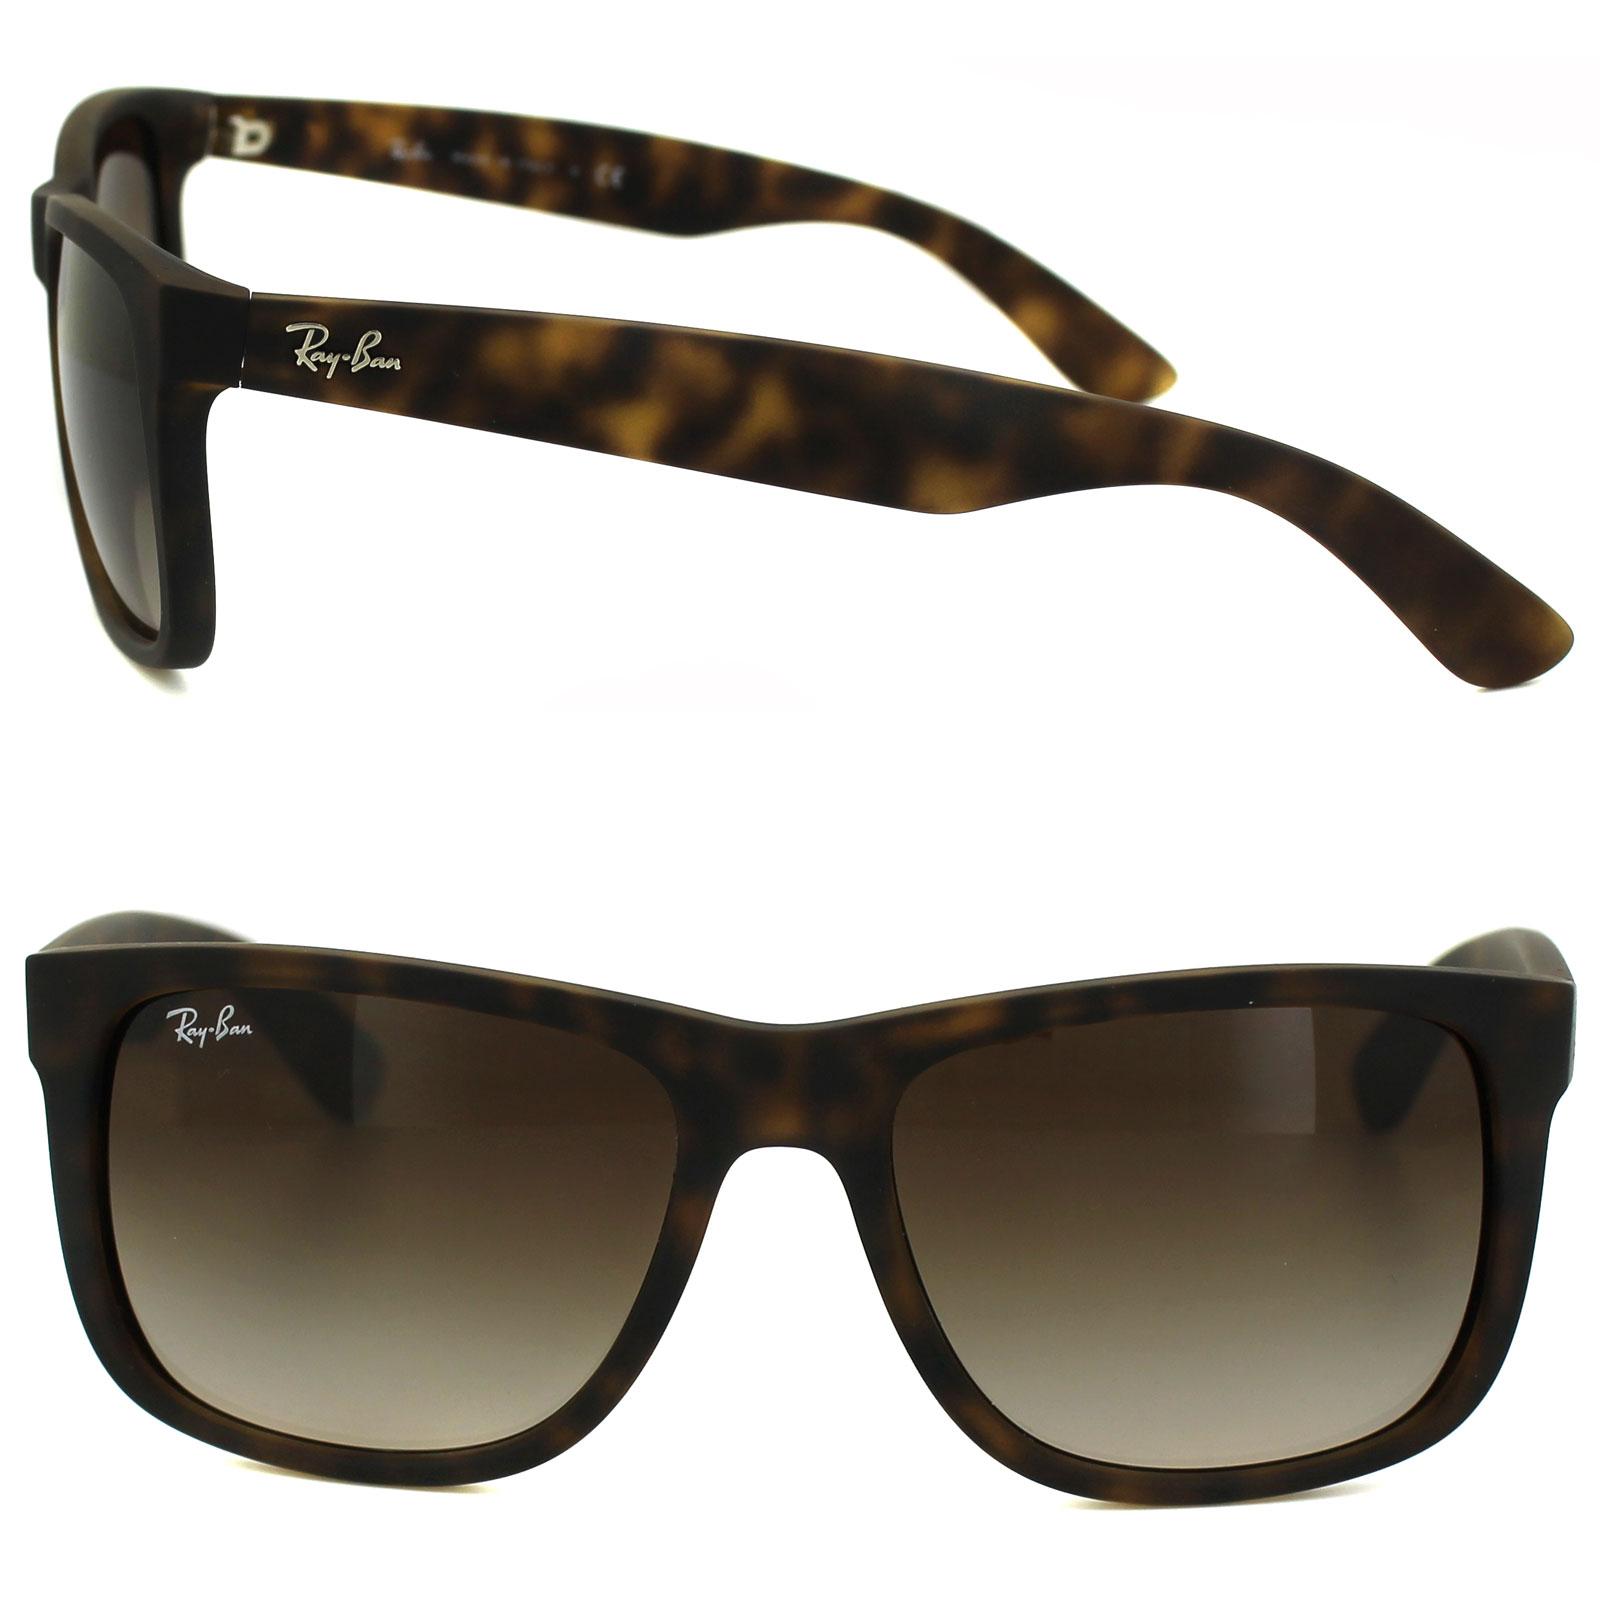 626ed712b05 ... release date ray ban 4165 justin 710 13 havana rubber finish sunglasses  92428 8e7cc ...